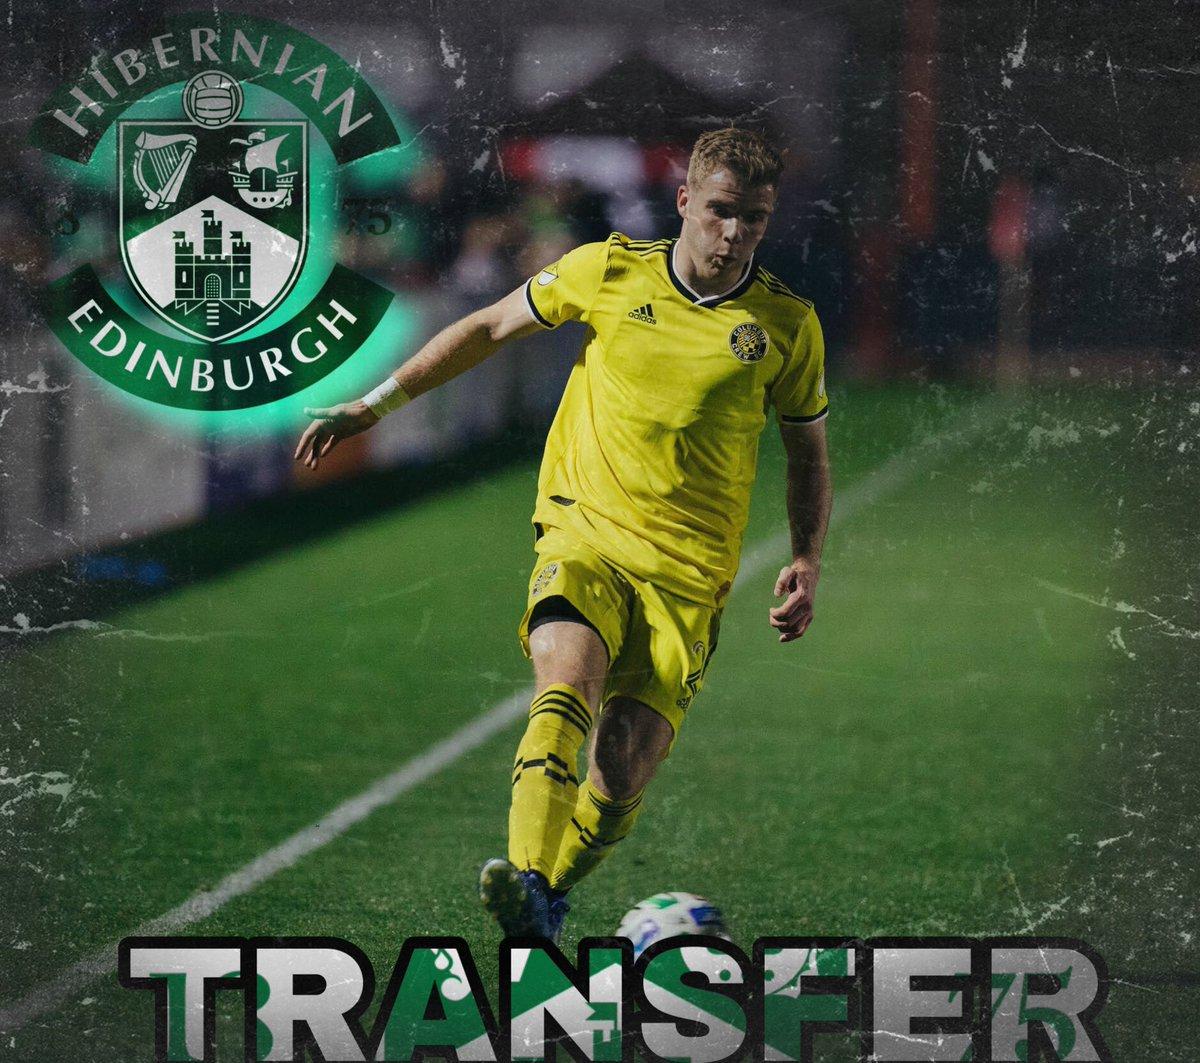 Columbus Crew midfielder Chris Cadden has officially transferred to Hibernian FC in the Scottish Premiership. #Crew96 #HibernianFC